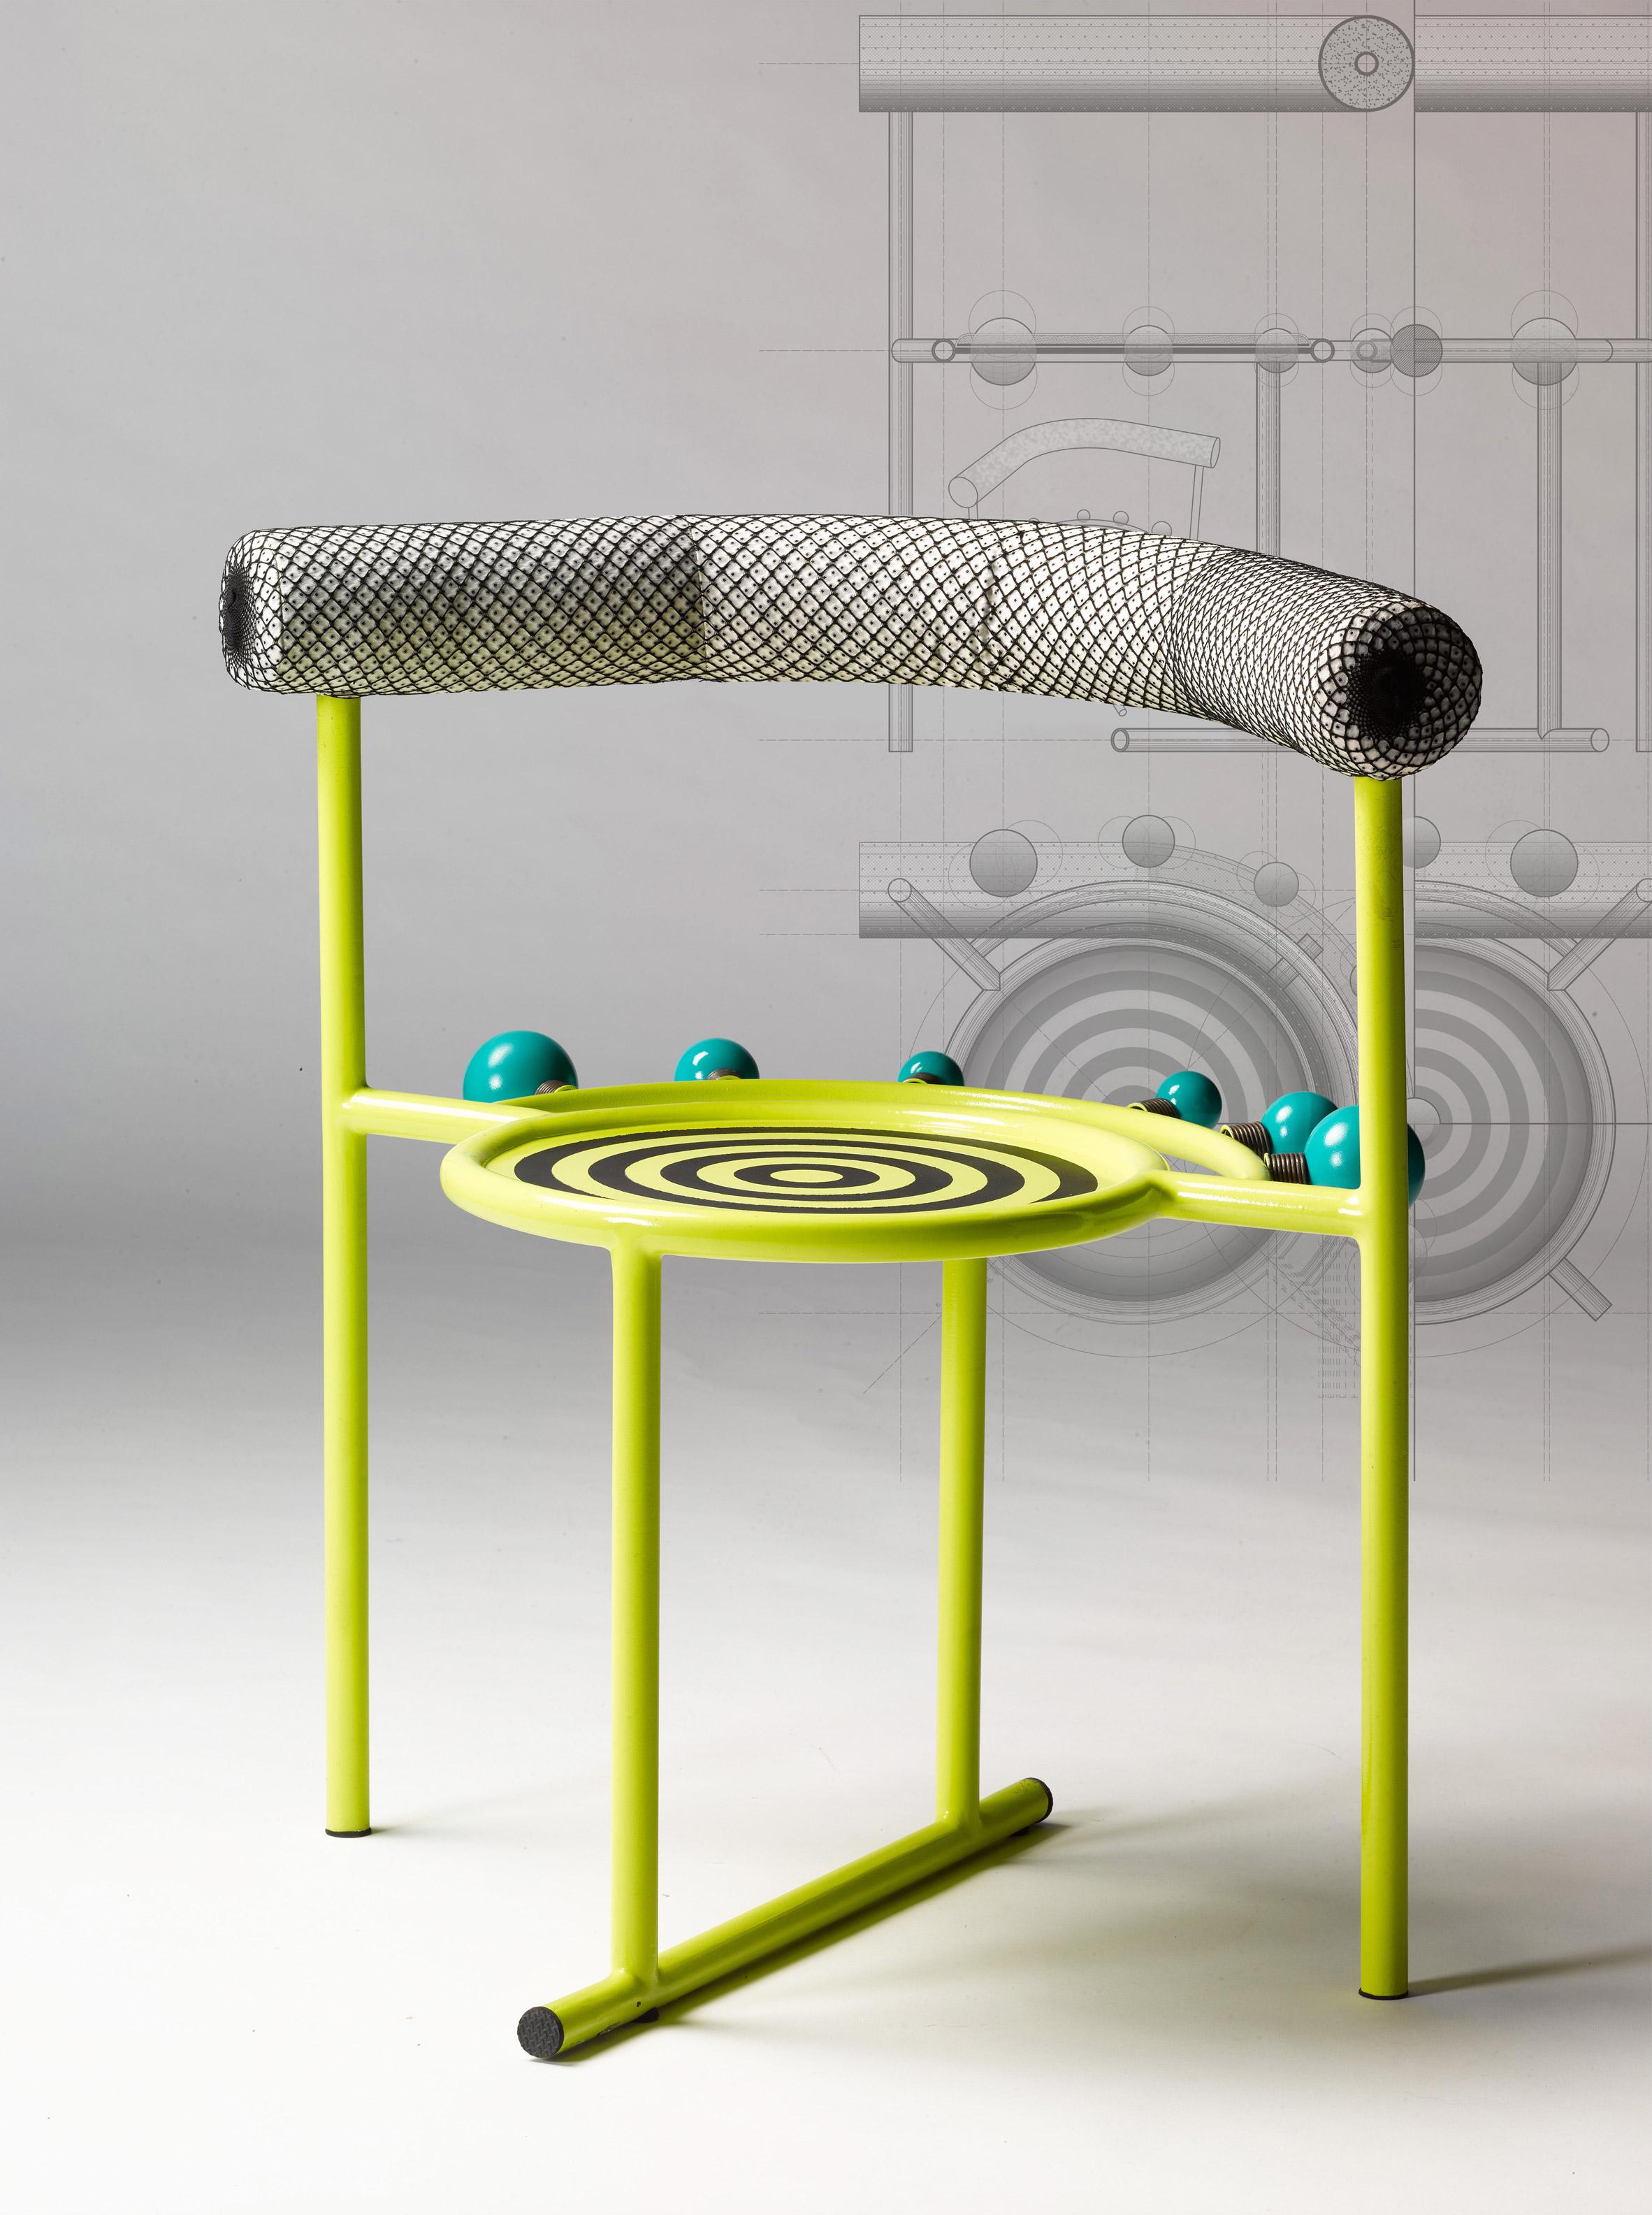 hu-yuming-chairs-behaviour-graduate-china-design_dezeen_2364_col_9